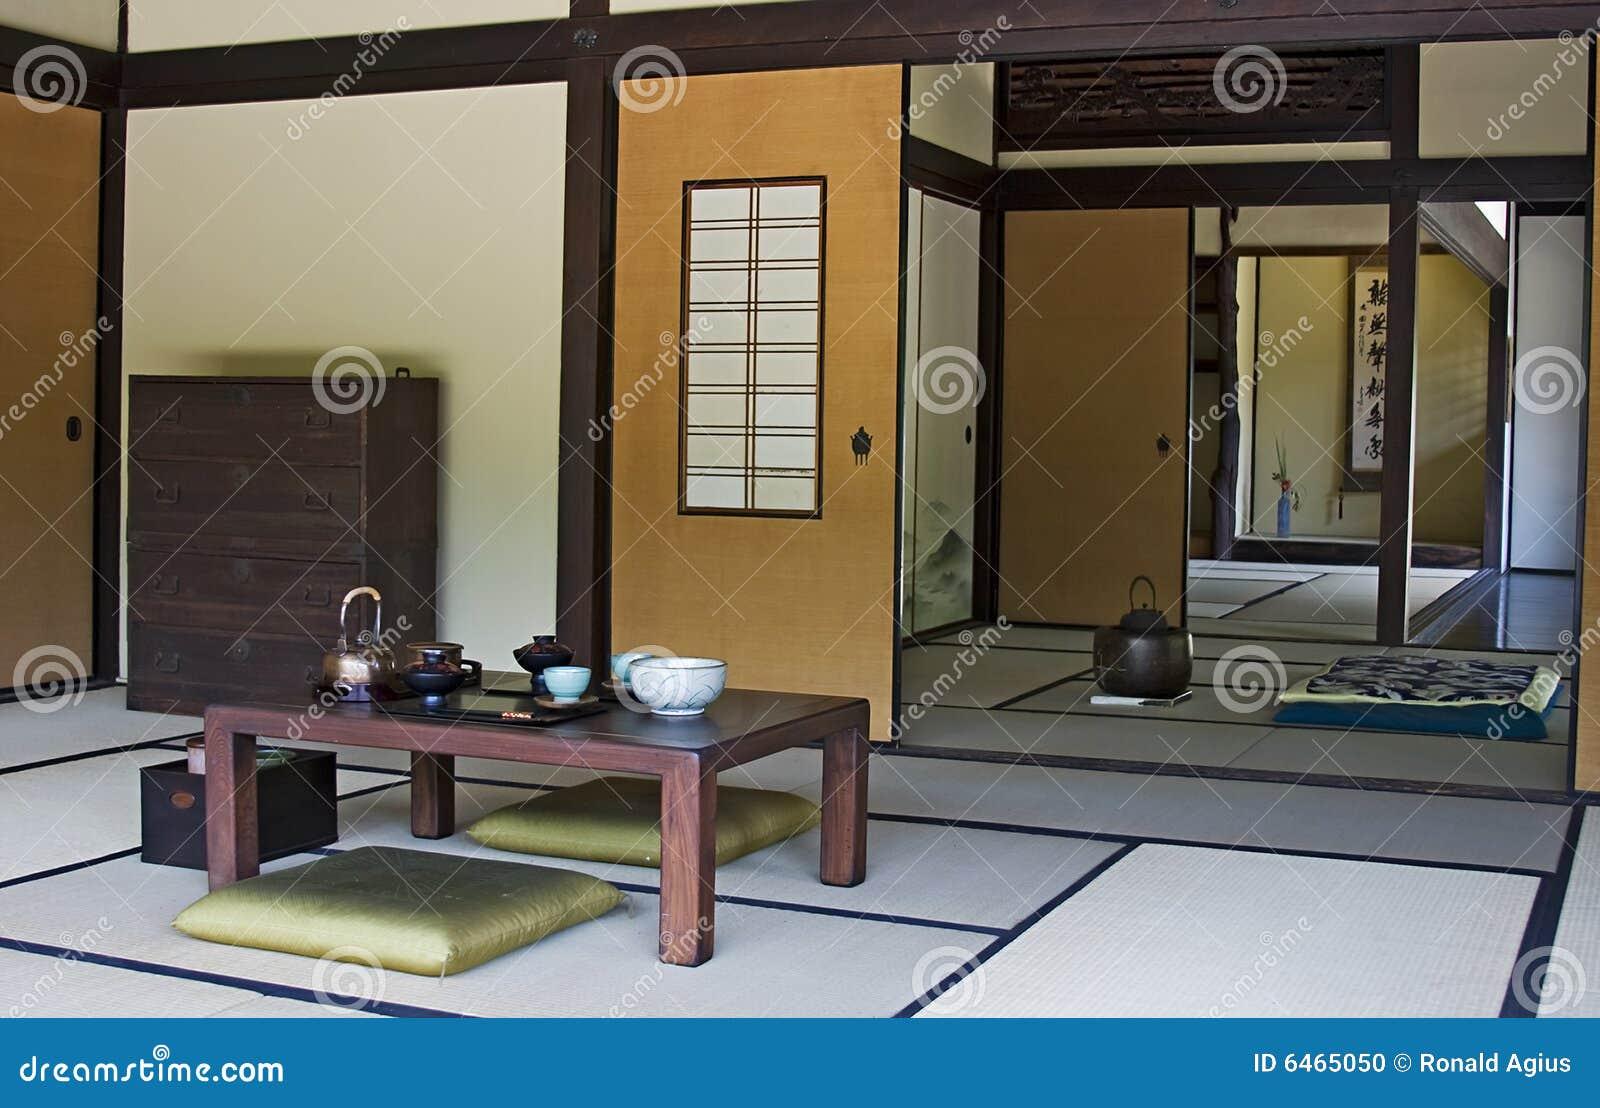 Japanisches haus stockfoto bild 6465050 for Klassisches japanisches haus